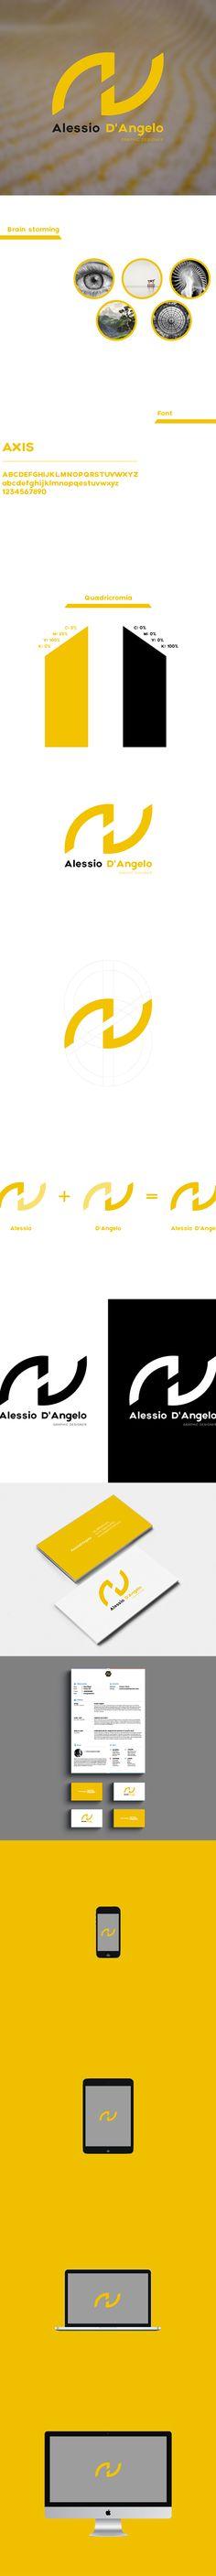 Personal Branding on Behance